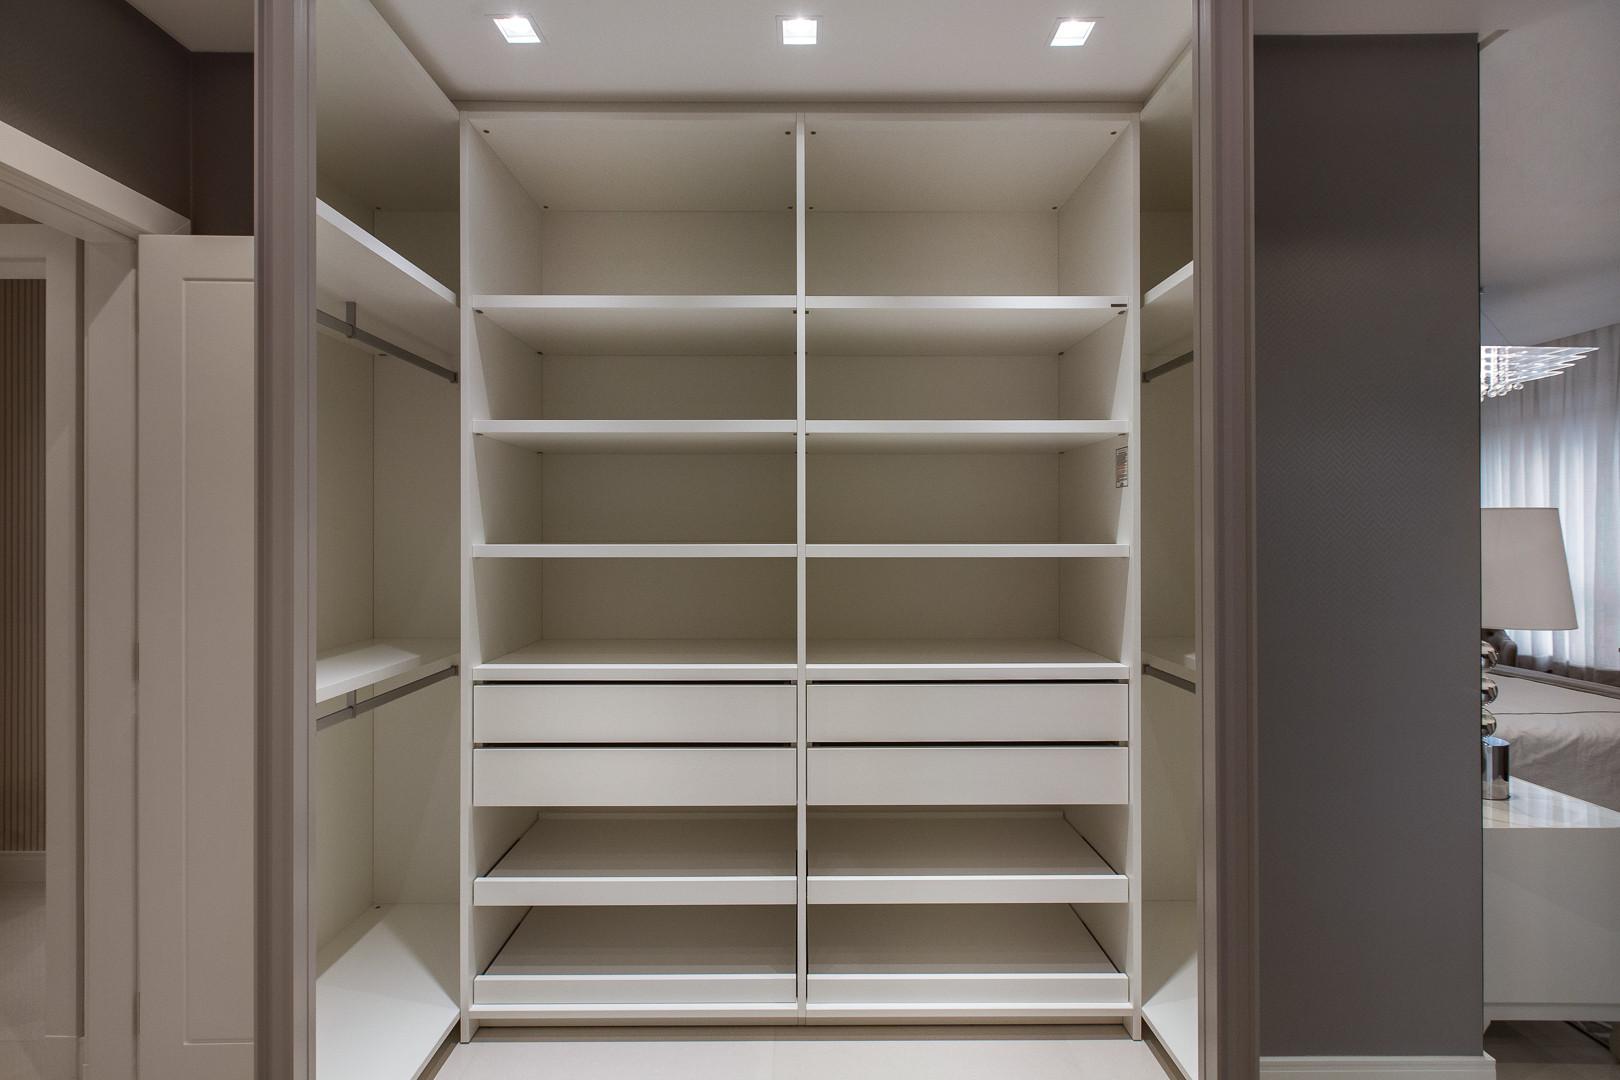 baturite-lounge-house-suite-master-closet-detalhe.jpg